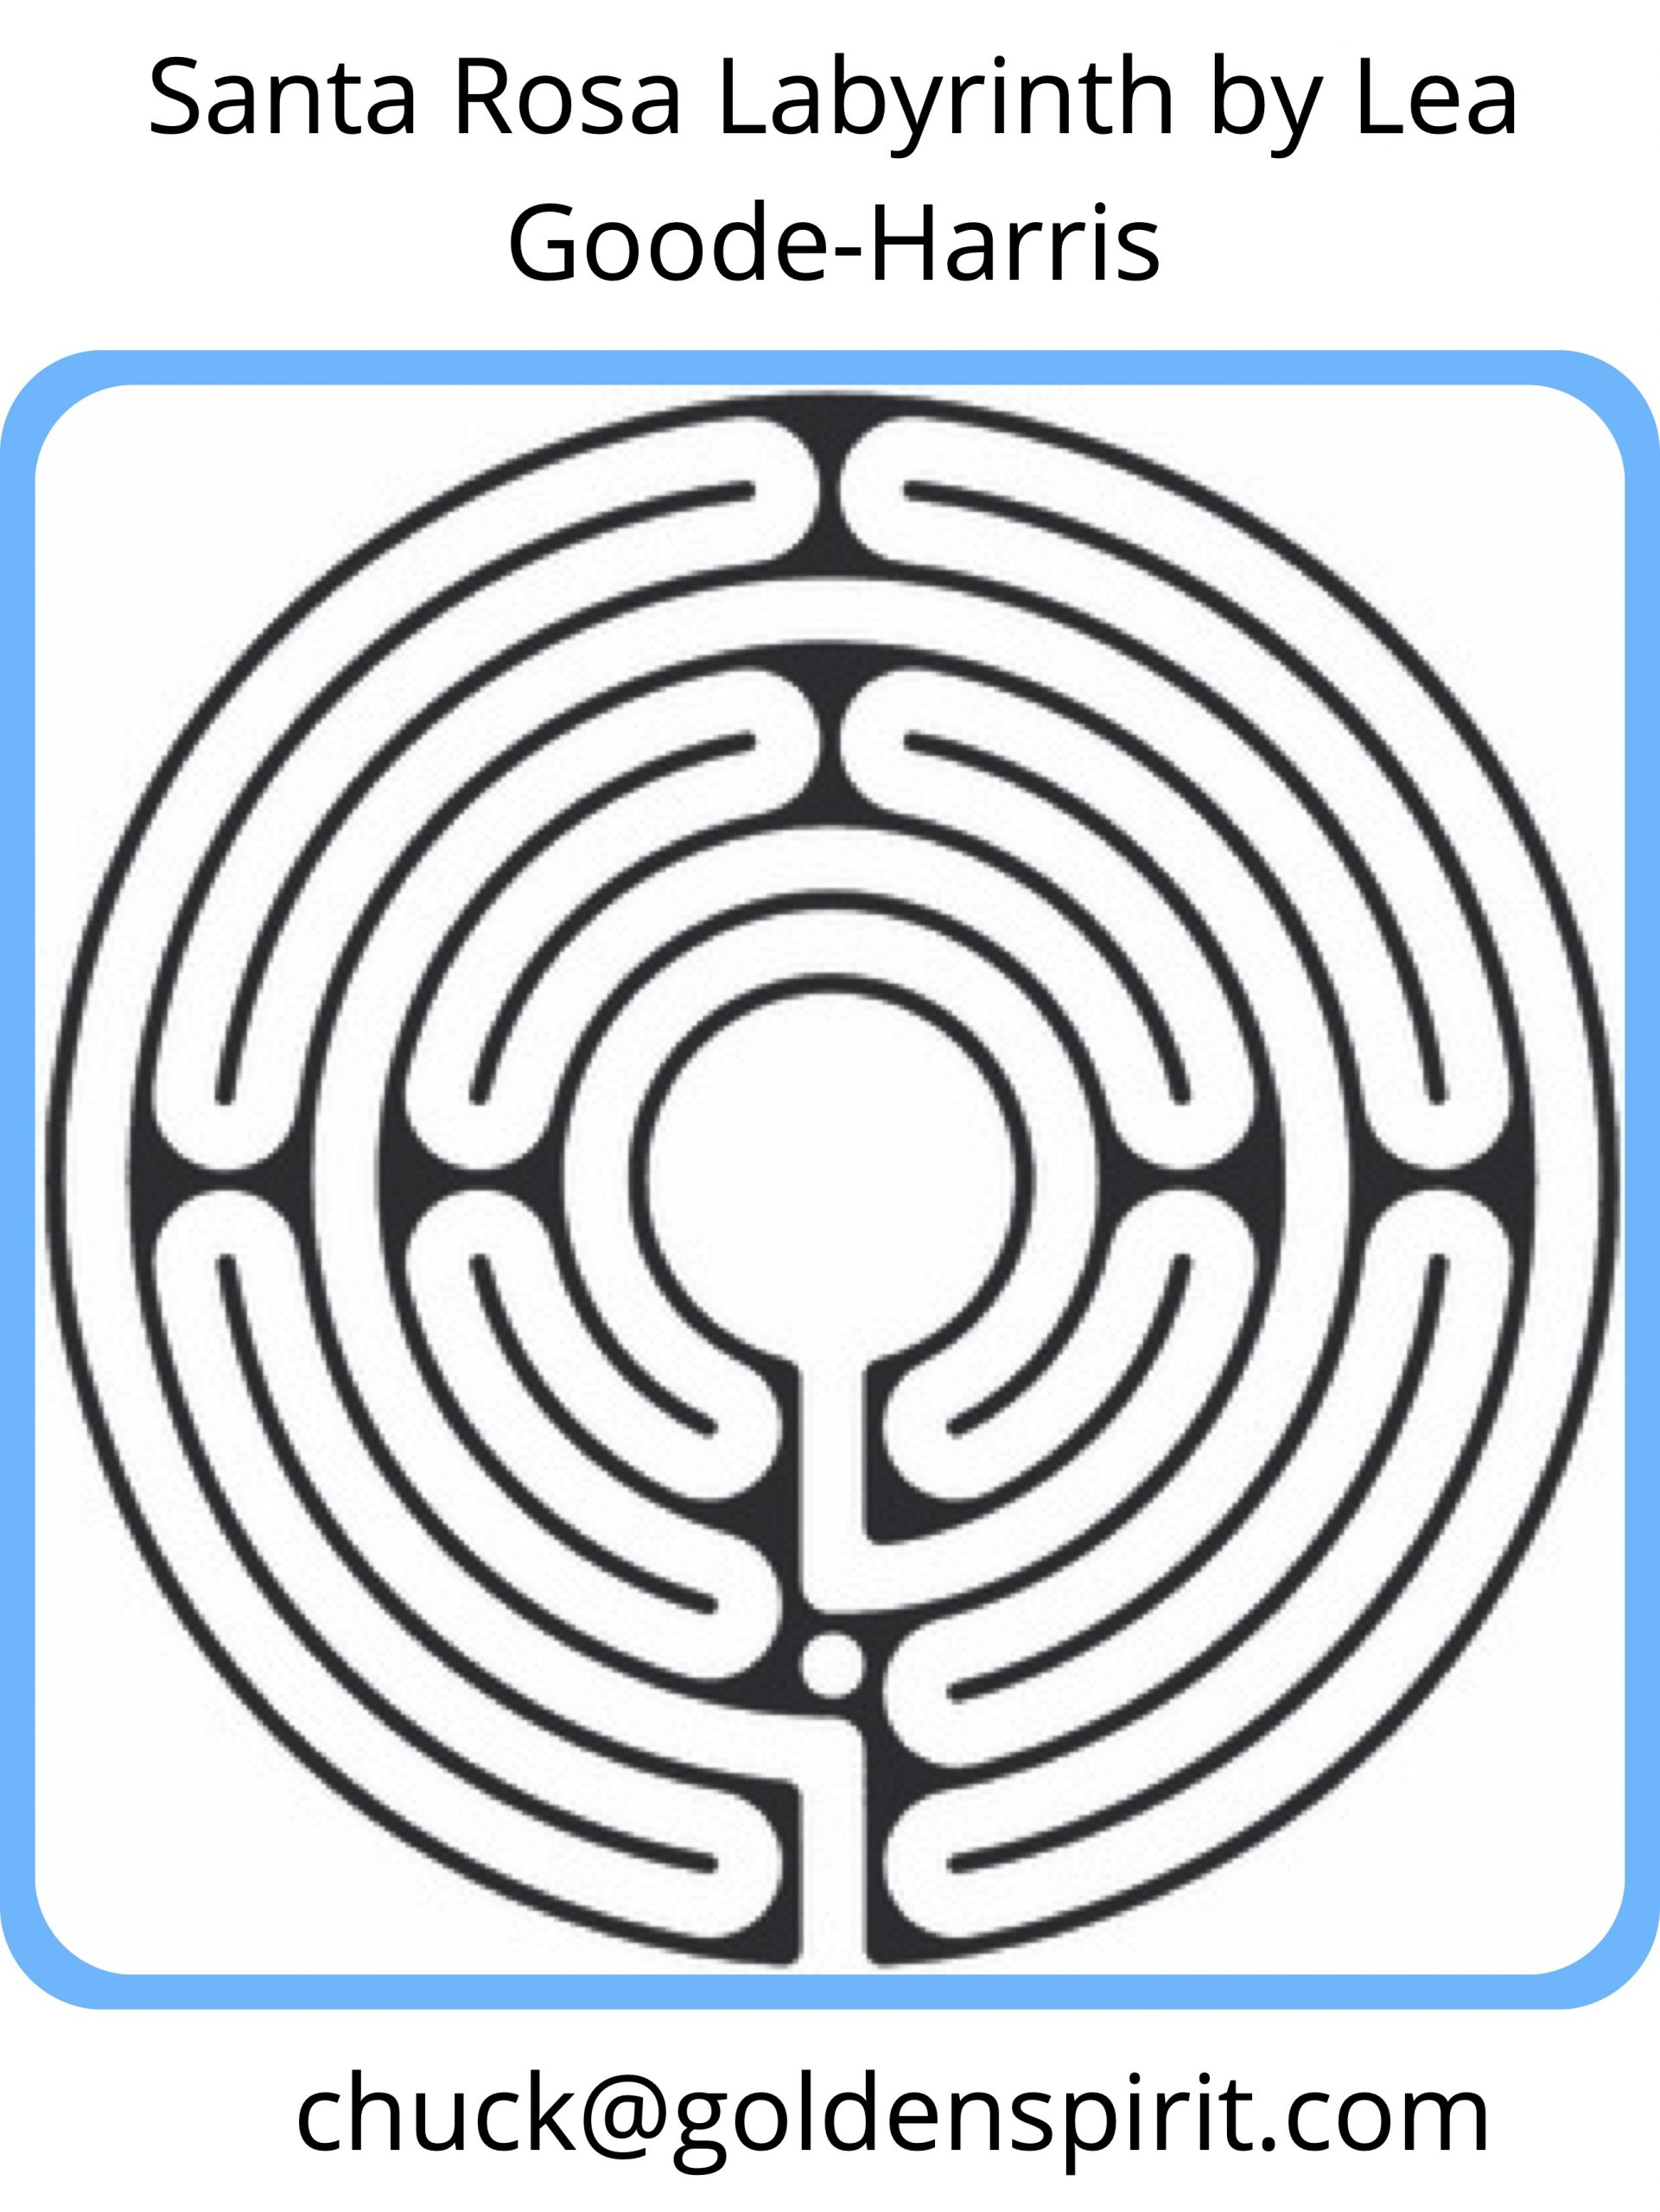 labyrinth, virtual mind body spirit festival